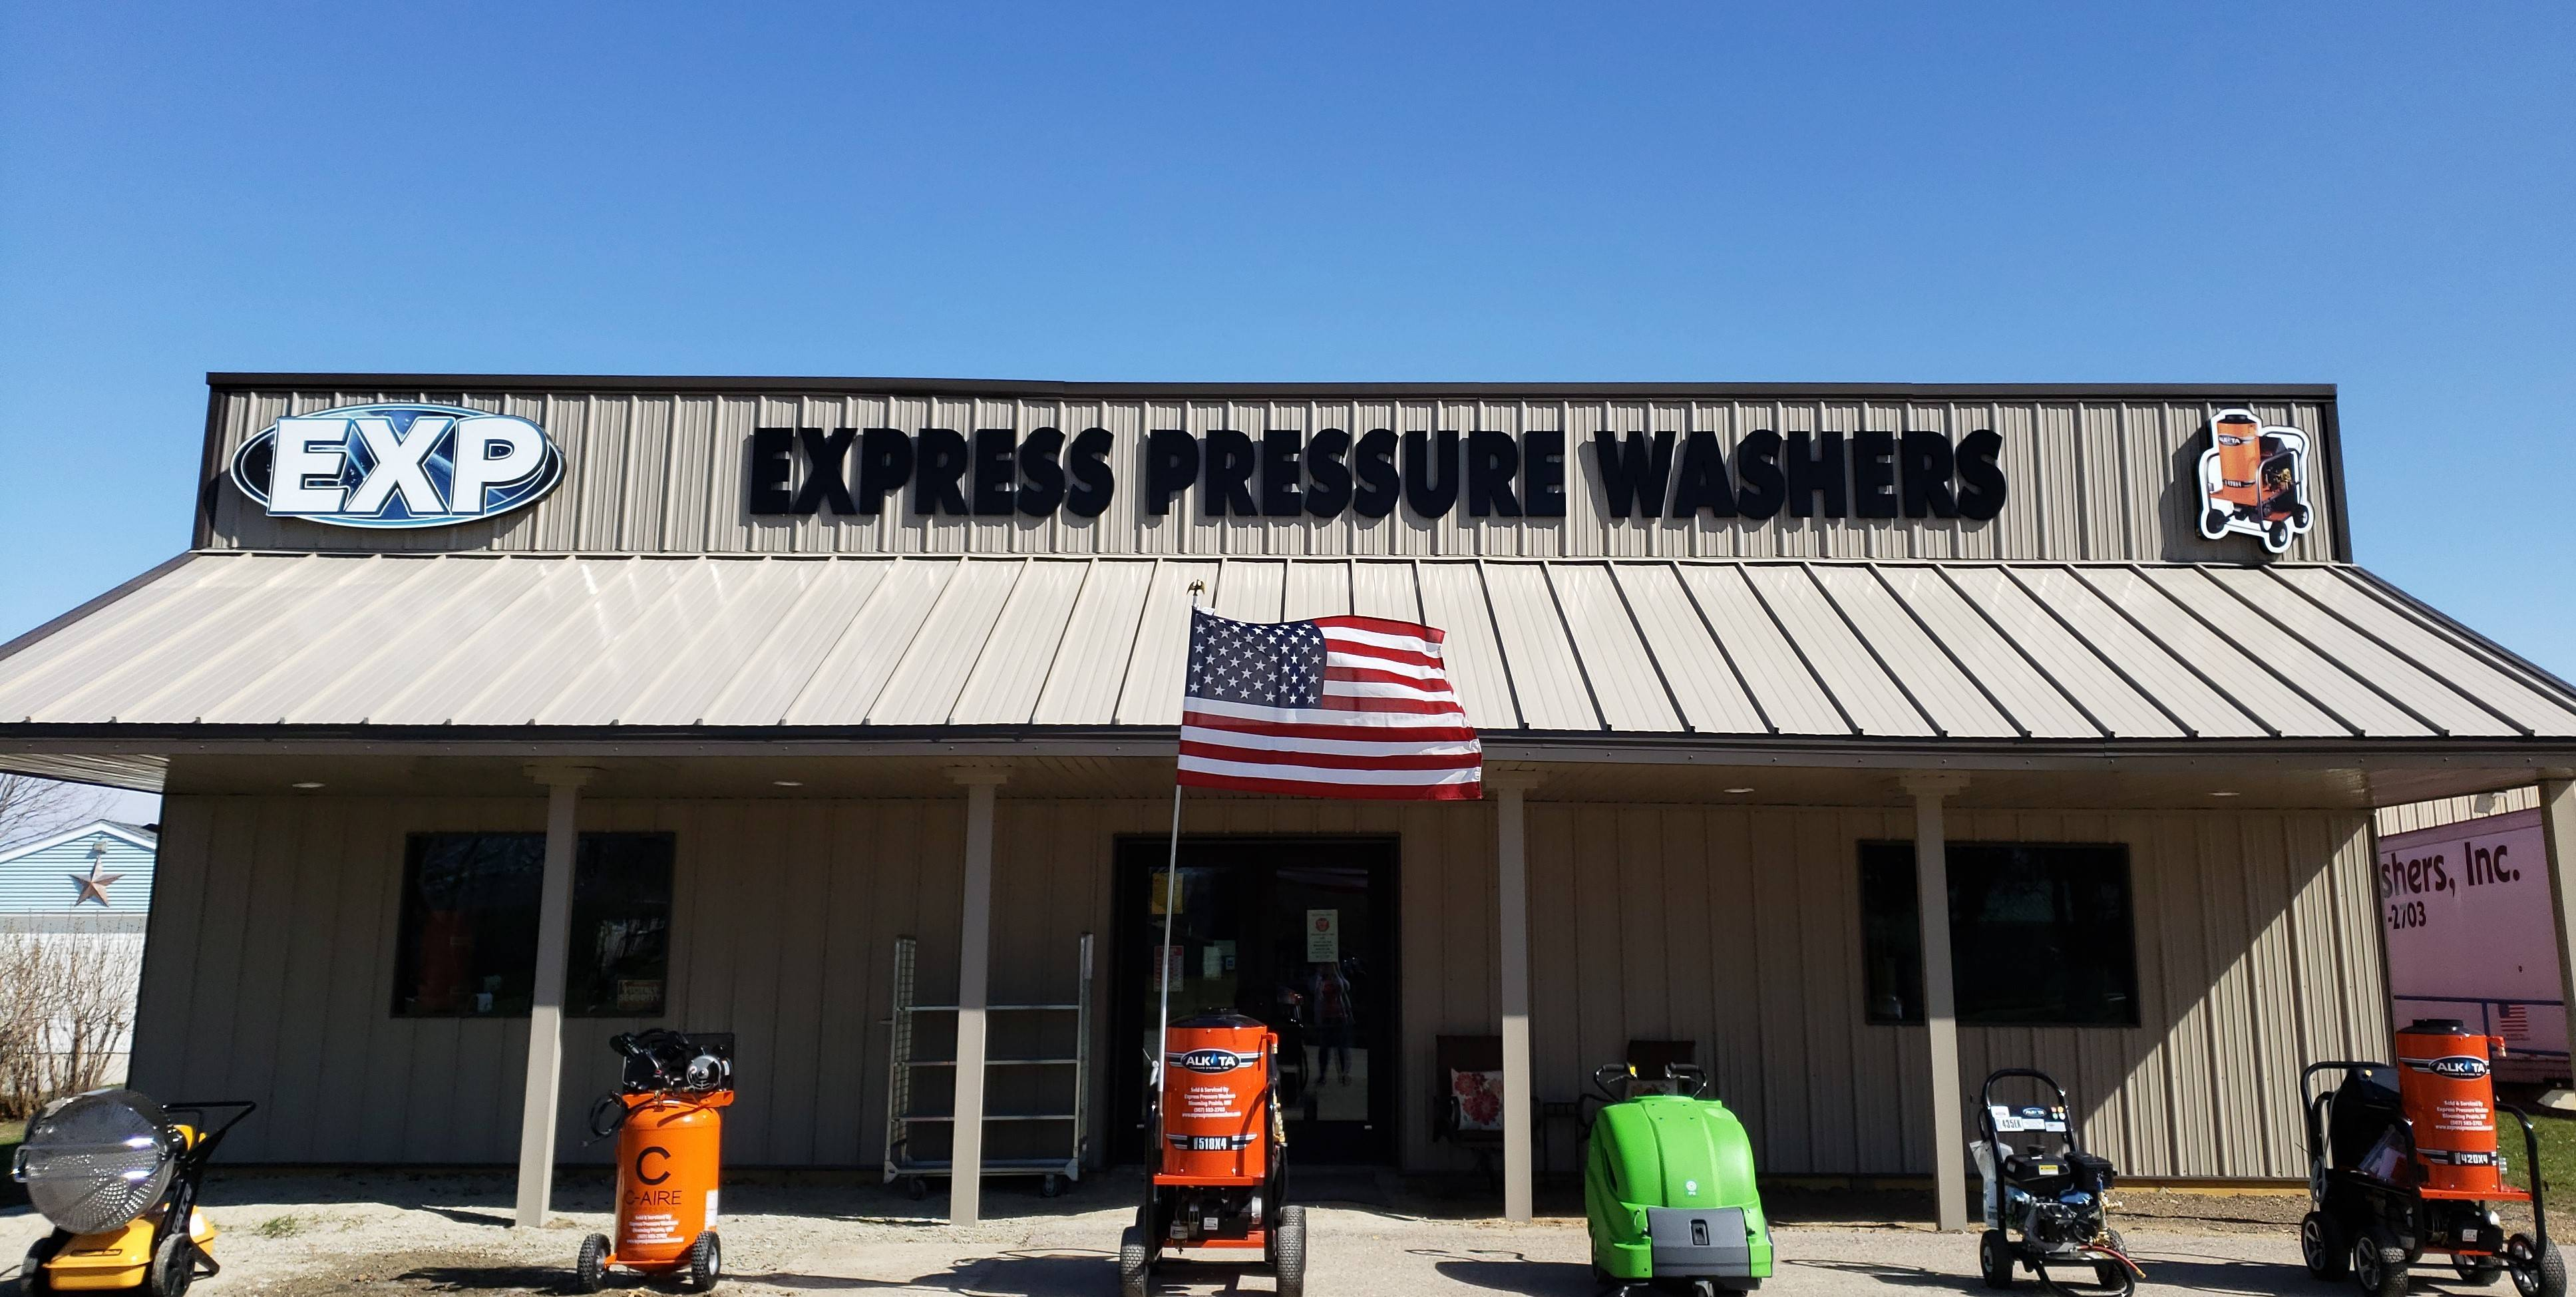 Express Pressure Washers